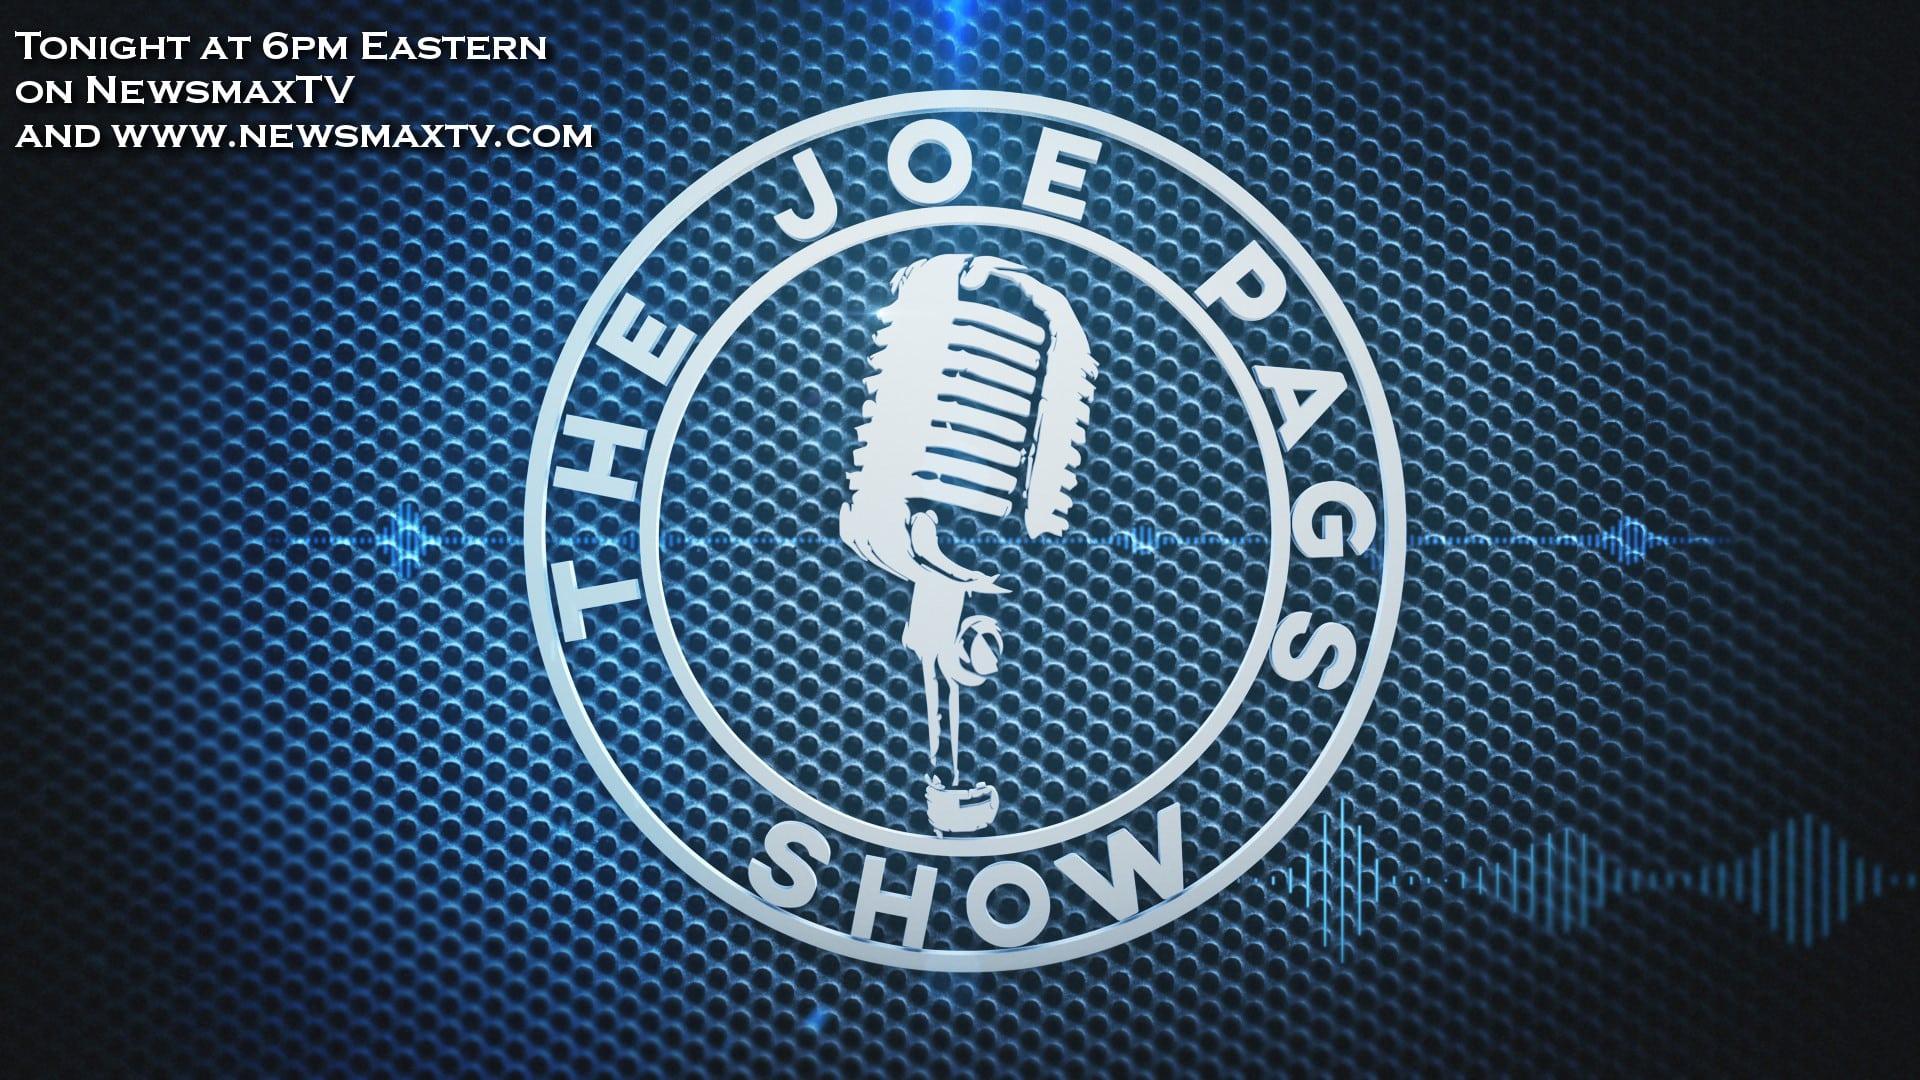 Catch The Joe Pags Show M-F on NewsmaxTV!